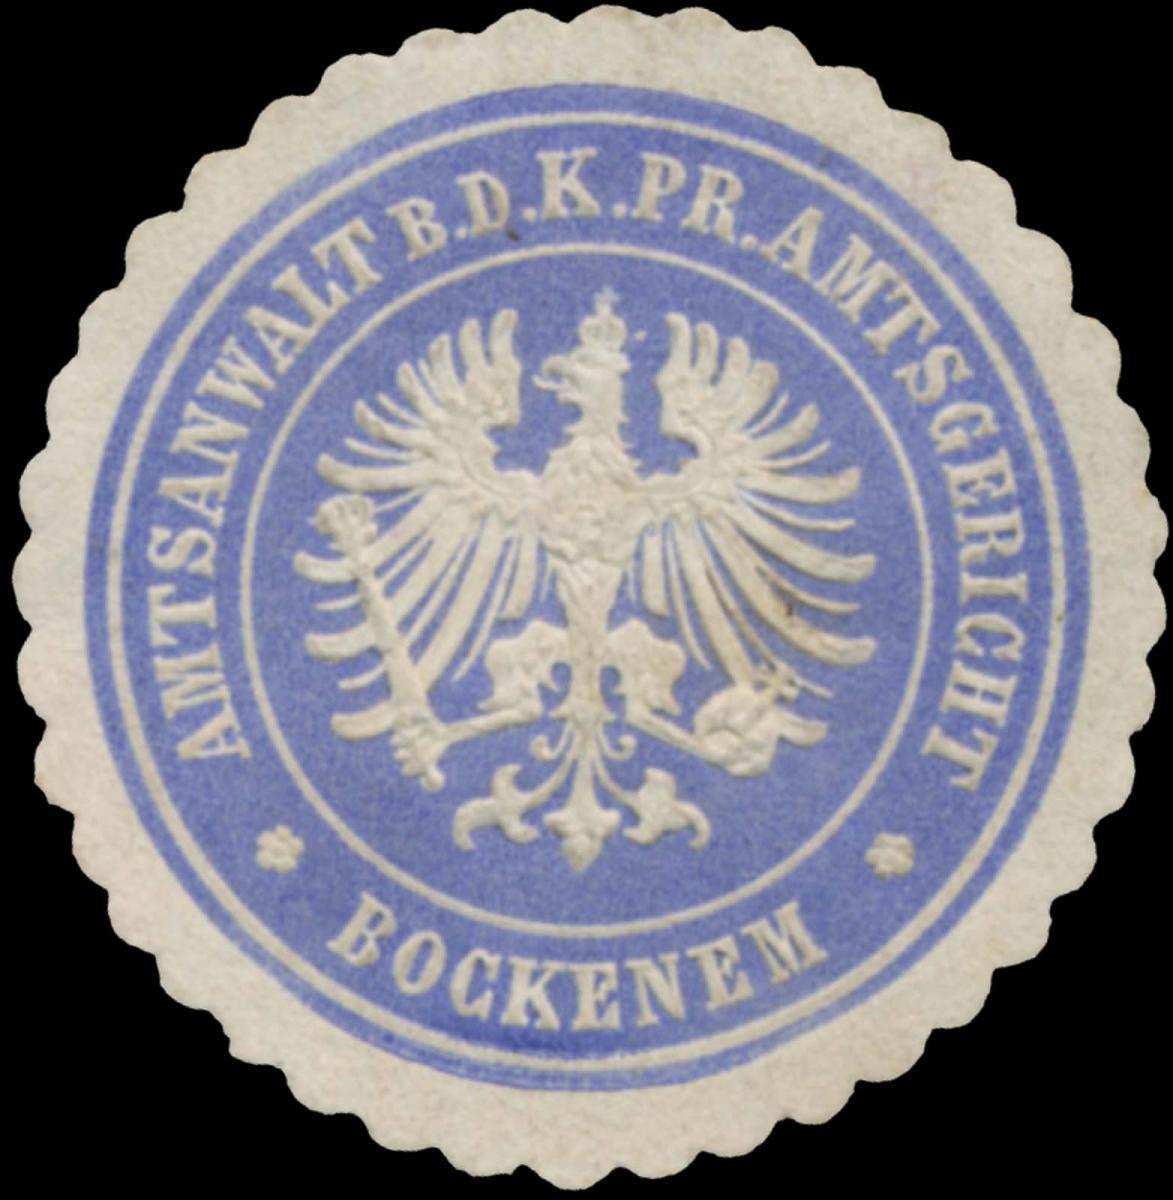 Amtsanwalt b.d. K.Pr. Amtsgericht Bockenem